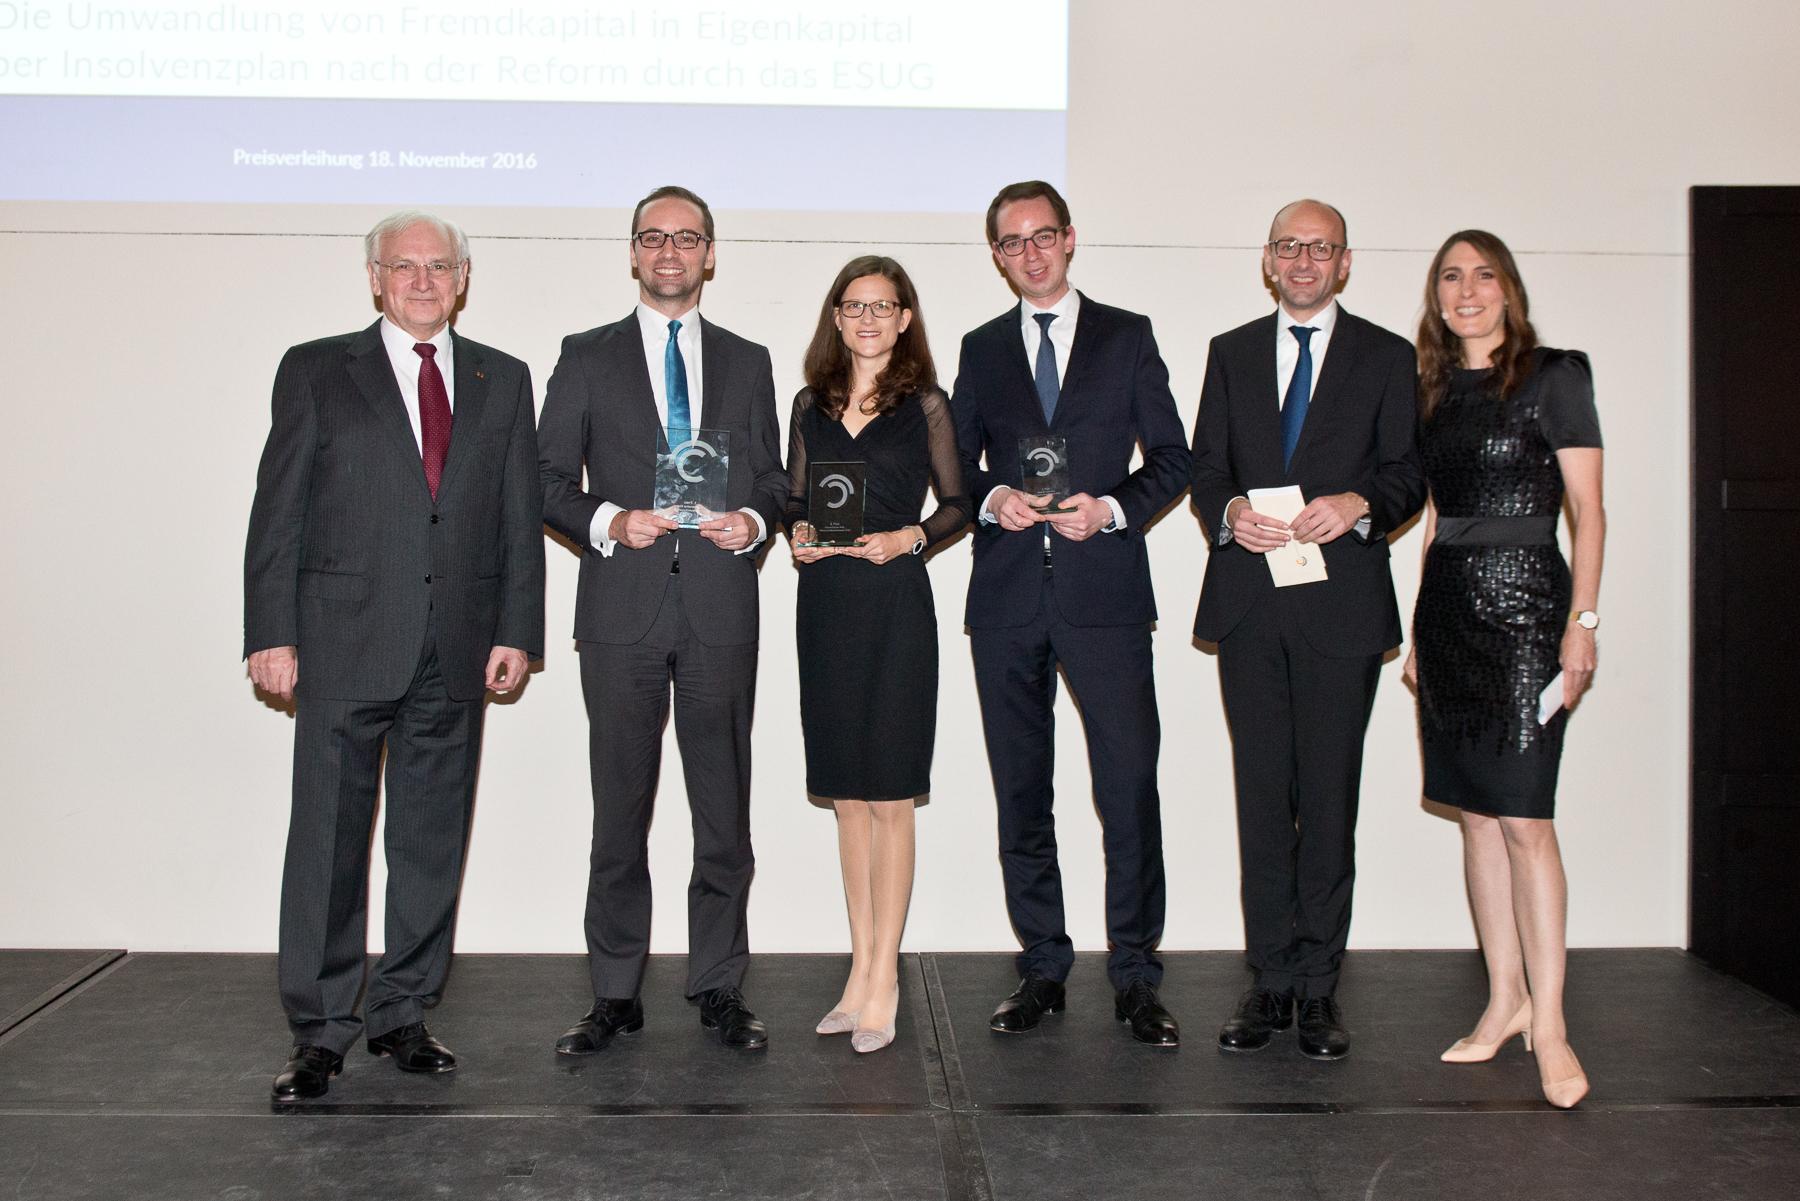 Prof. Siegfried Beck, Dr Florian Bartels (winner), Dr Andrea Braun (2nd prize), Dr Helge Pühl (3rd prize), Prof. Lucas F. Flöther, Anja Kohl